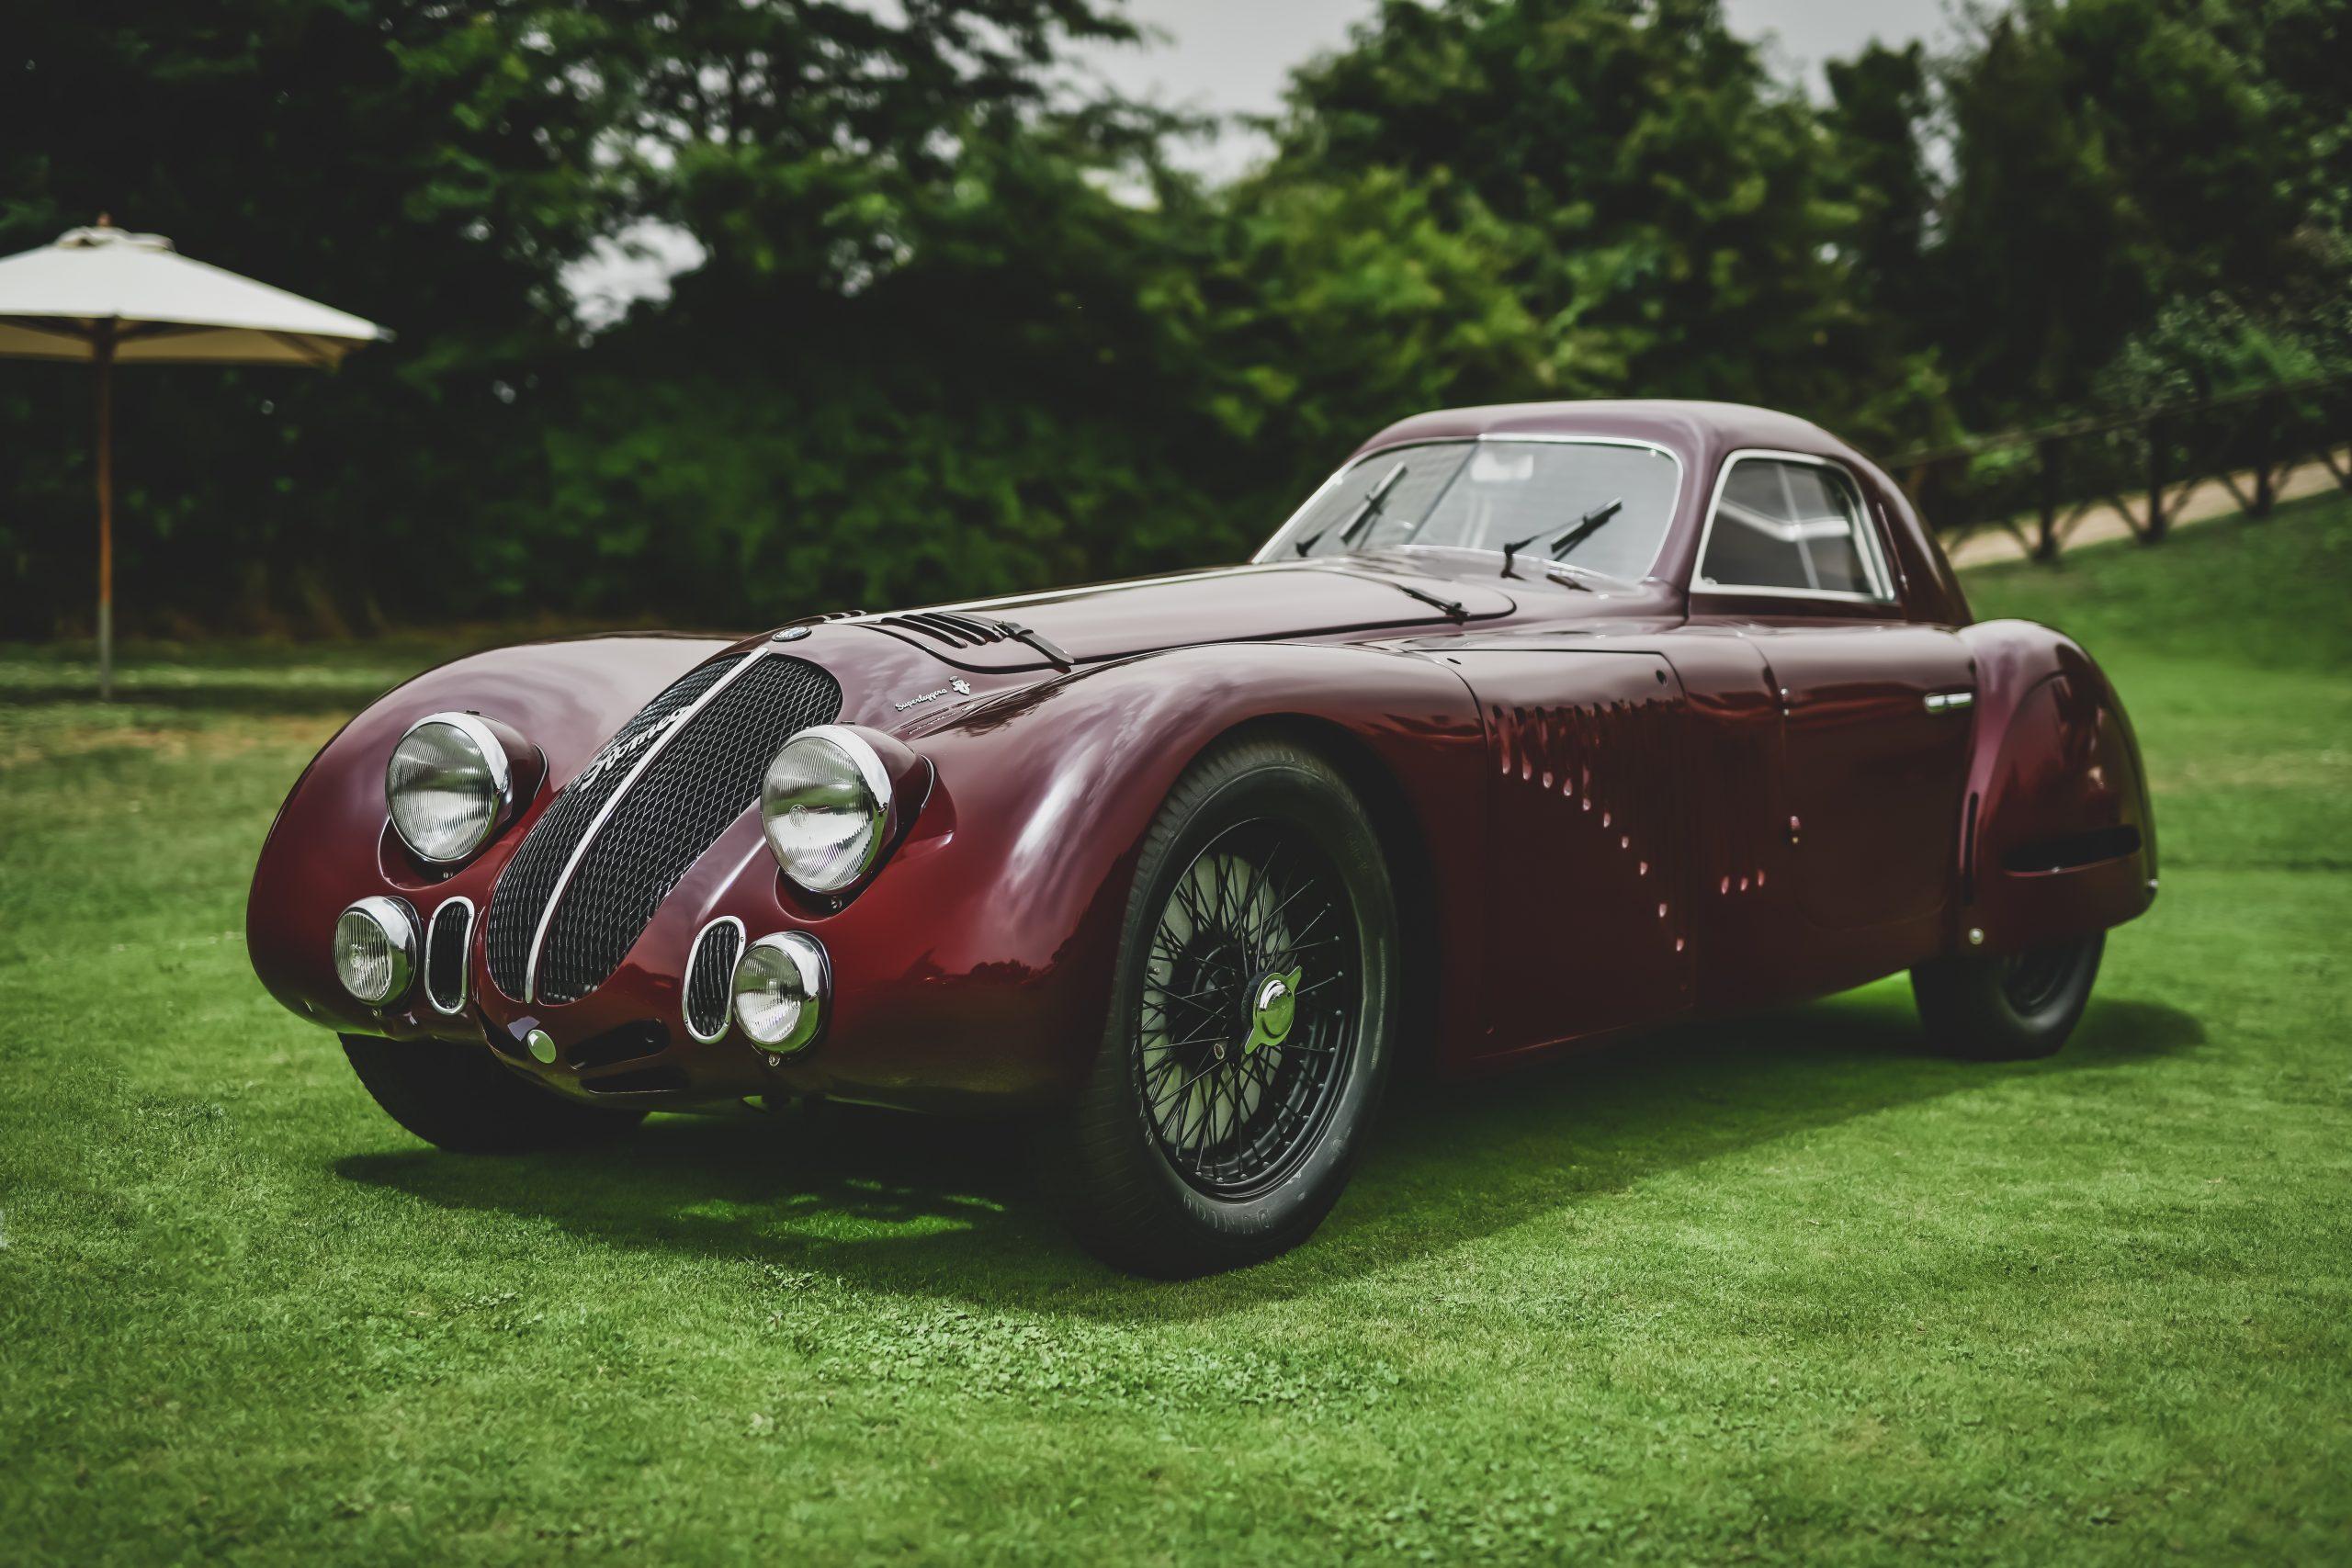 04 Alfa Romeo at REB Concours 2021 scaled Alfa Romeo, Παρελθόν και Παρόν, πάντα σε κόκκινο χρώμα Alfa, alfa romeo, REB Concours, ειδήσεις, Νέα